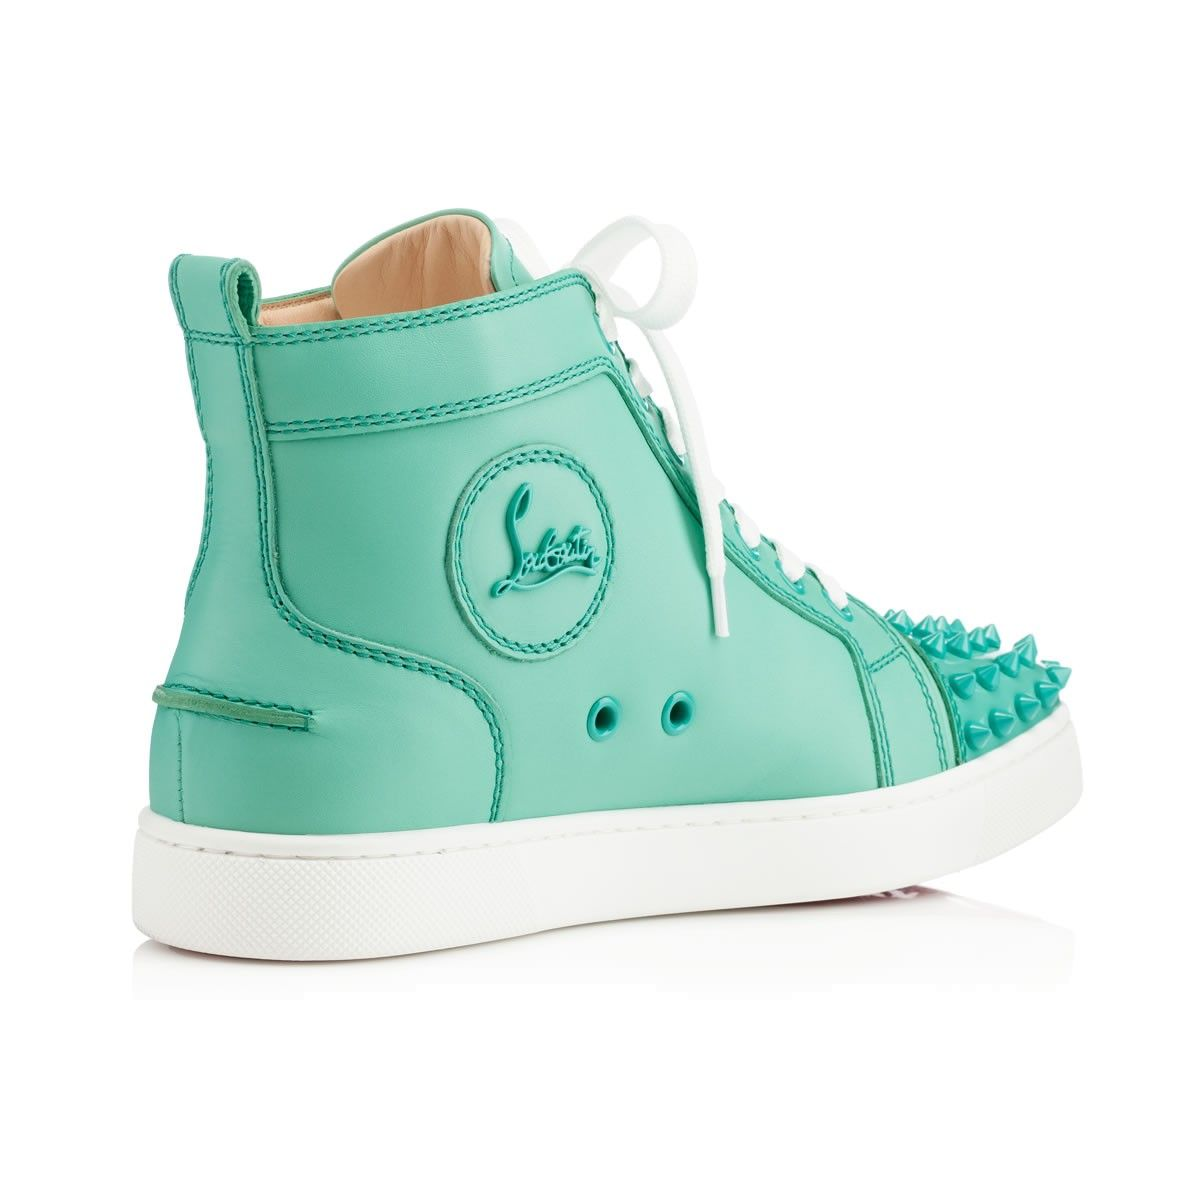 LOU SPIKES CALF,AQUAMAR,Calf,Louboutin,Women Shoes. Louboutin OnlineWomen's  FlatsCalvesSpikesShoe ...